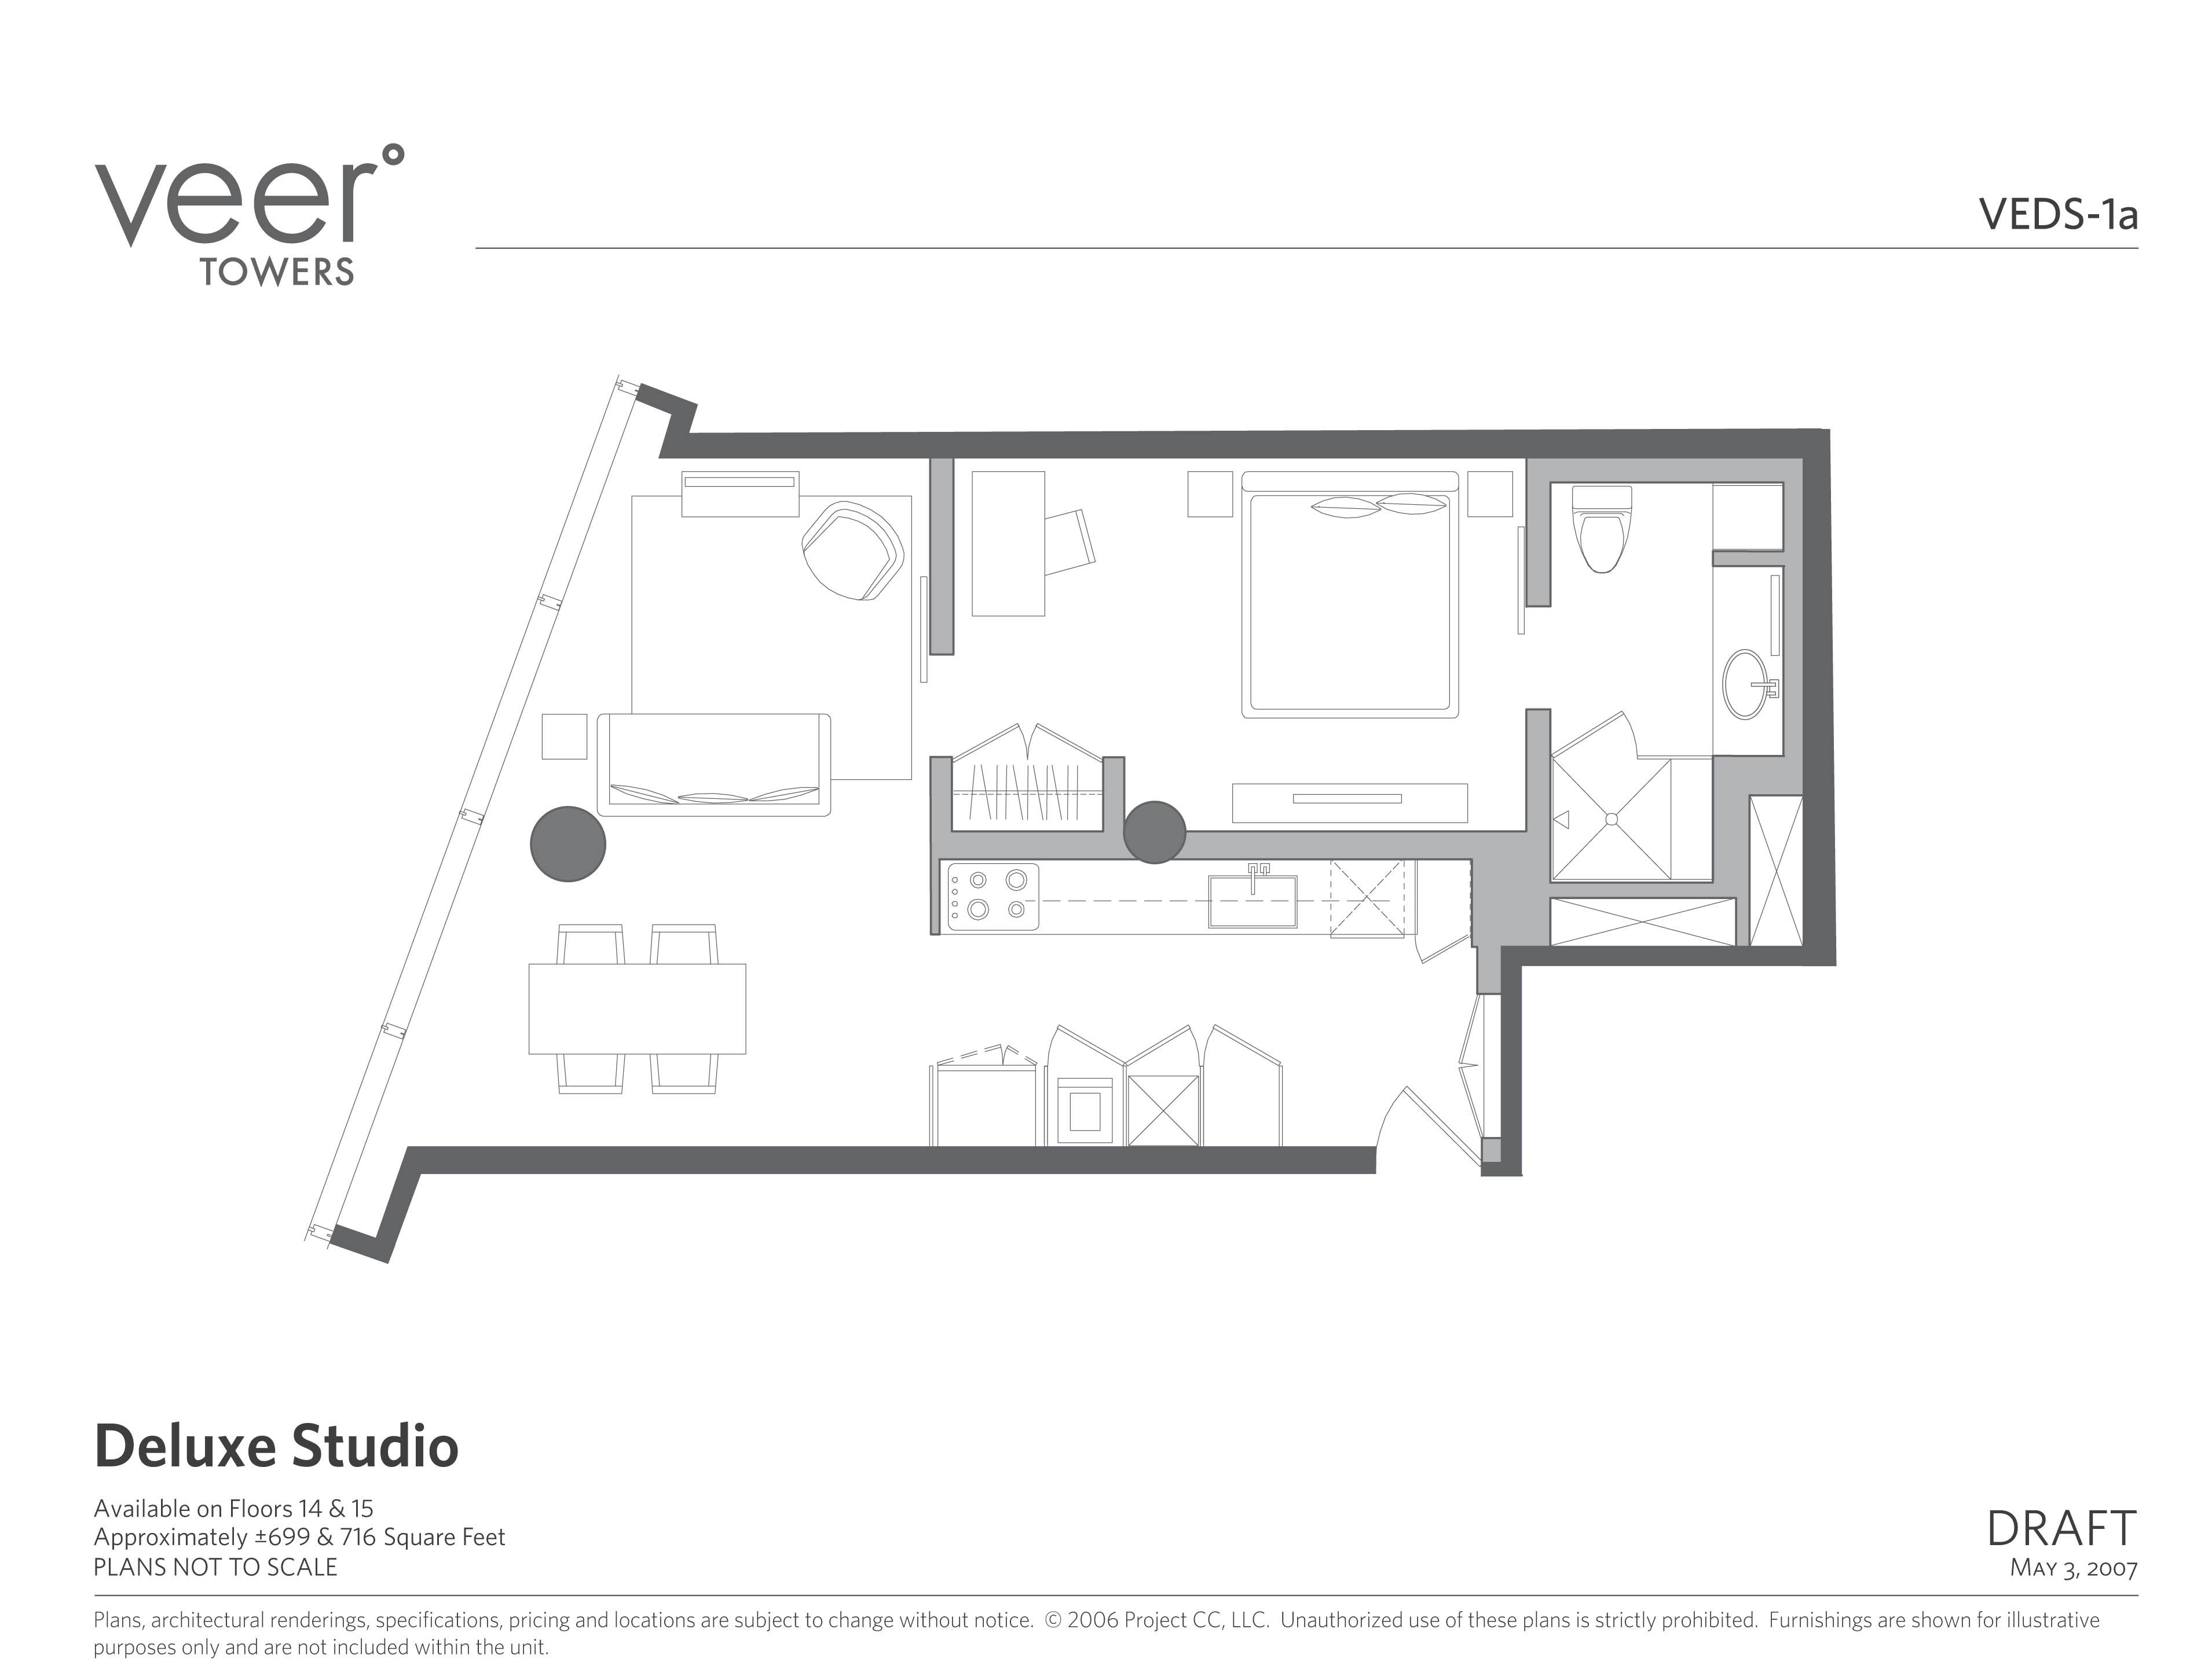 Veer Towers Deluxe Studio Floorplan Copy Las Vegas